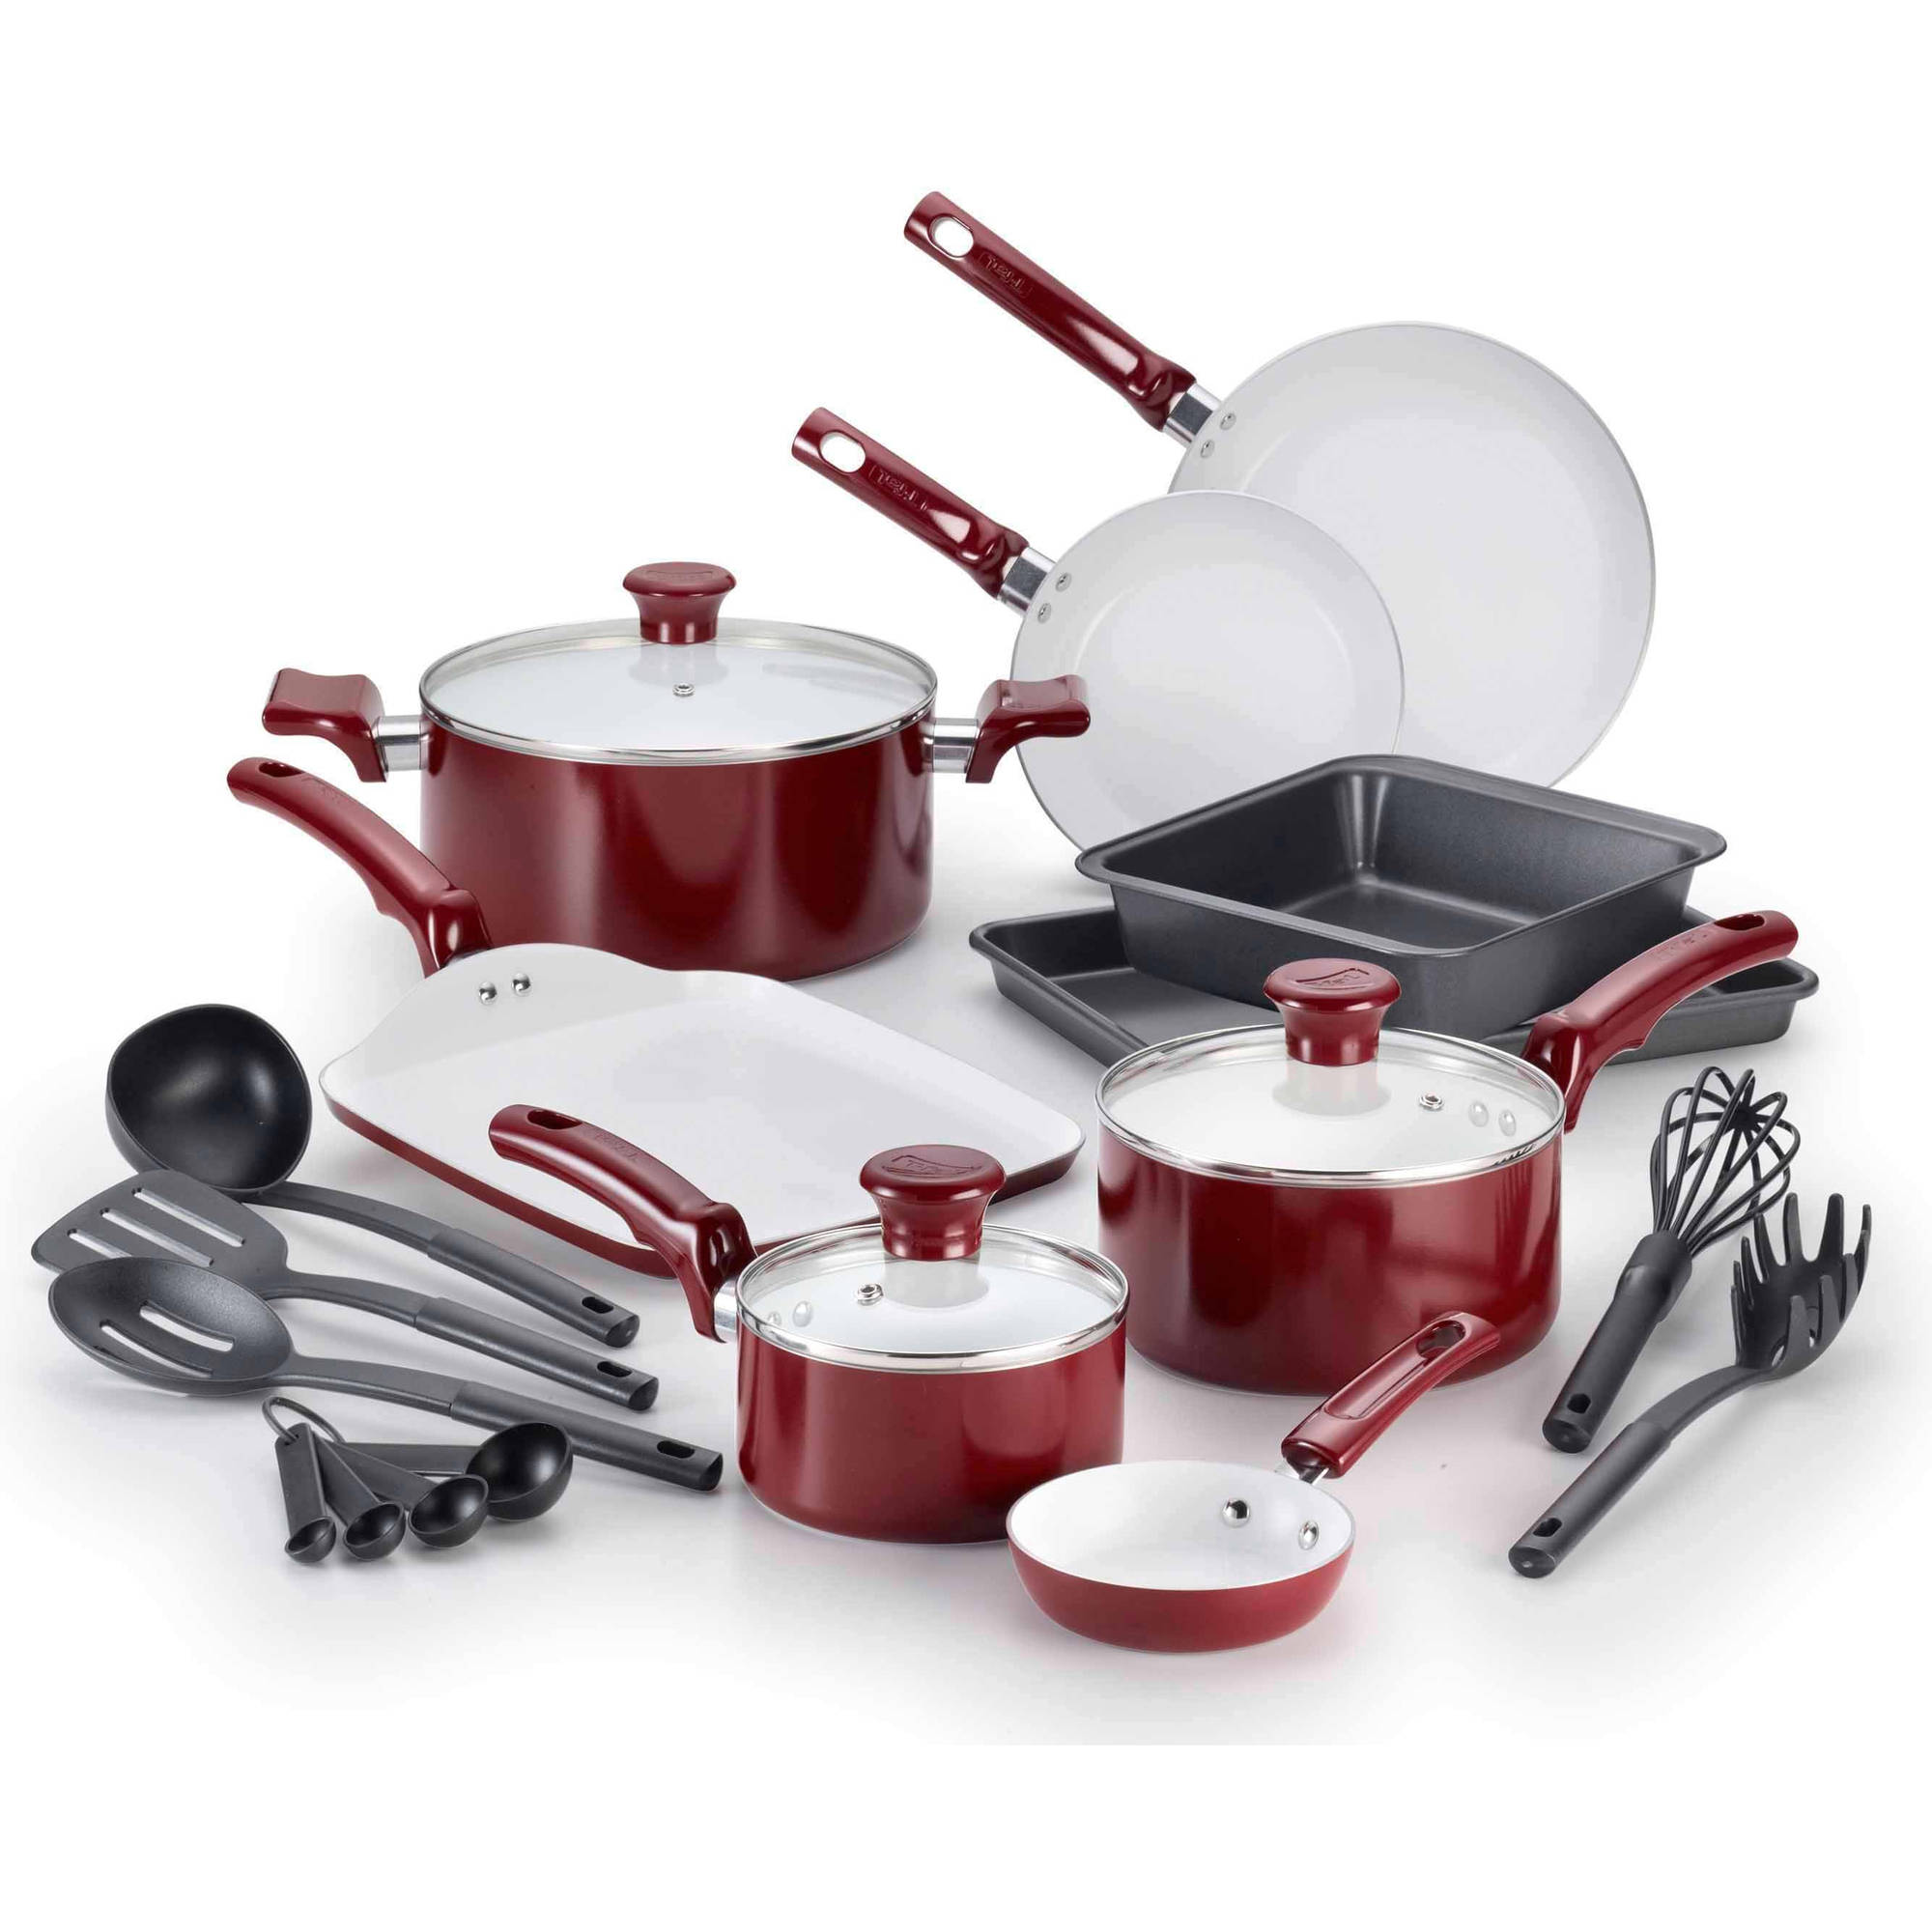 T-fal 18-Pc Ceramic Cookware Set